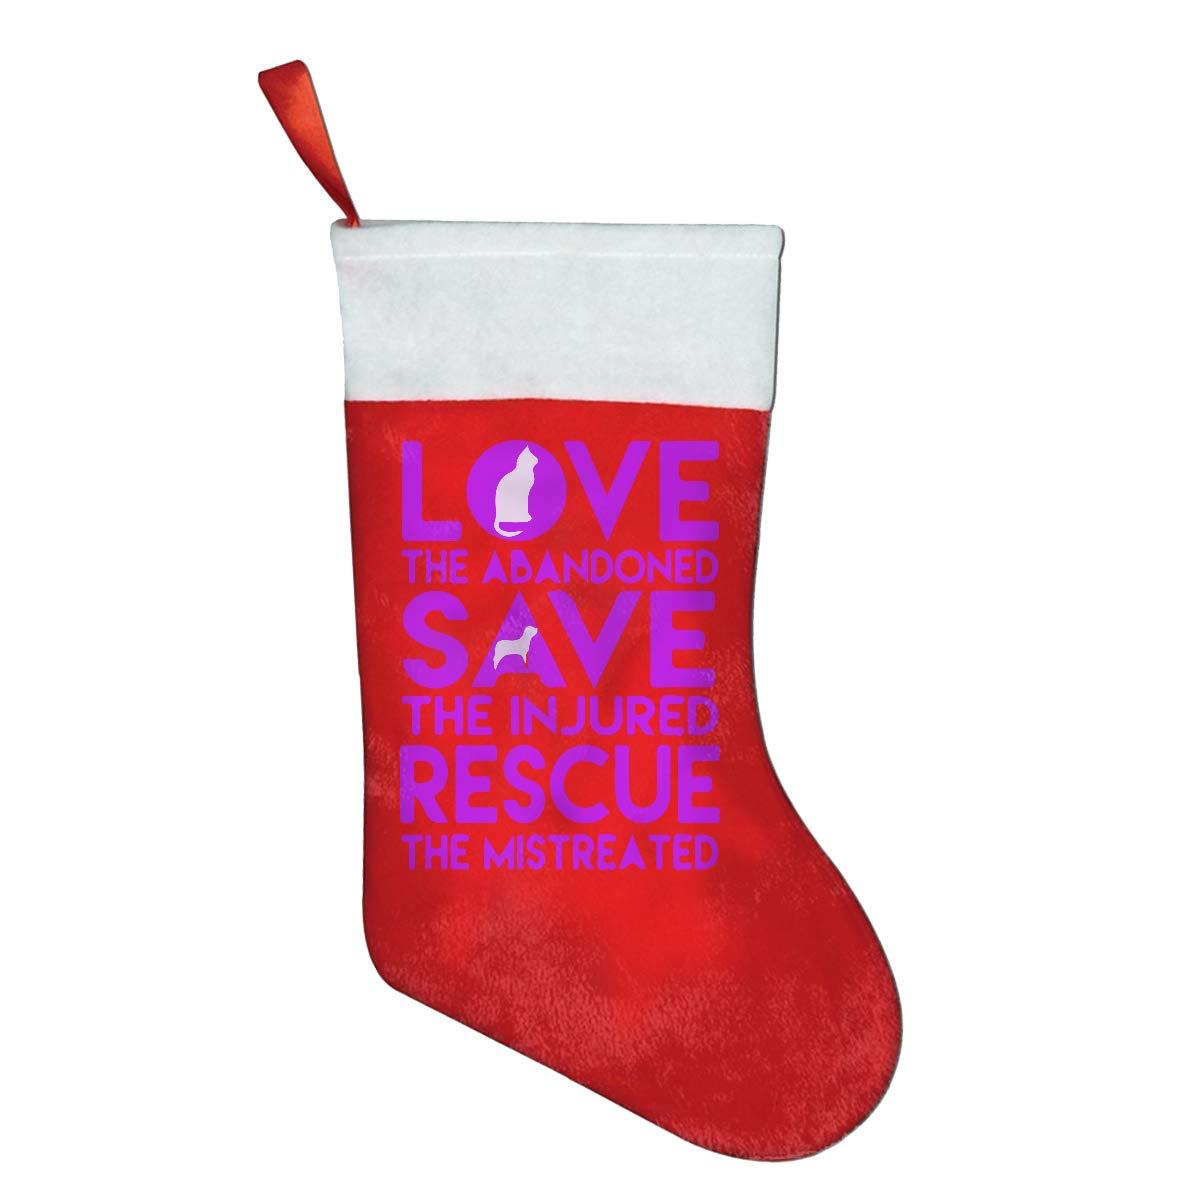 YISHOW Funny Dog Rescue Animal Cat Rescue Felt Christmas Stocking Party Accessory